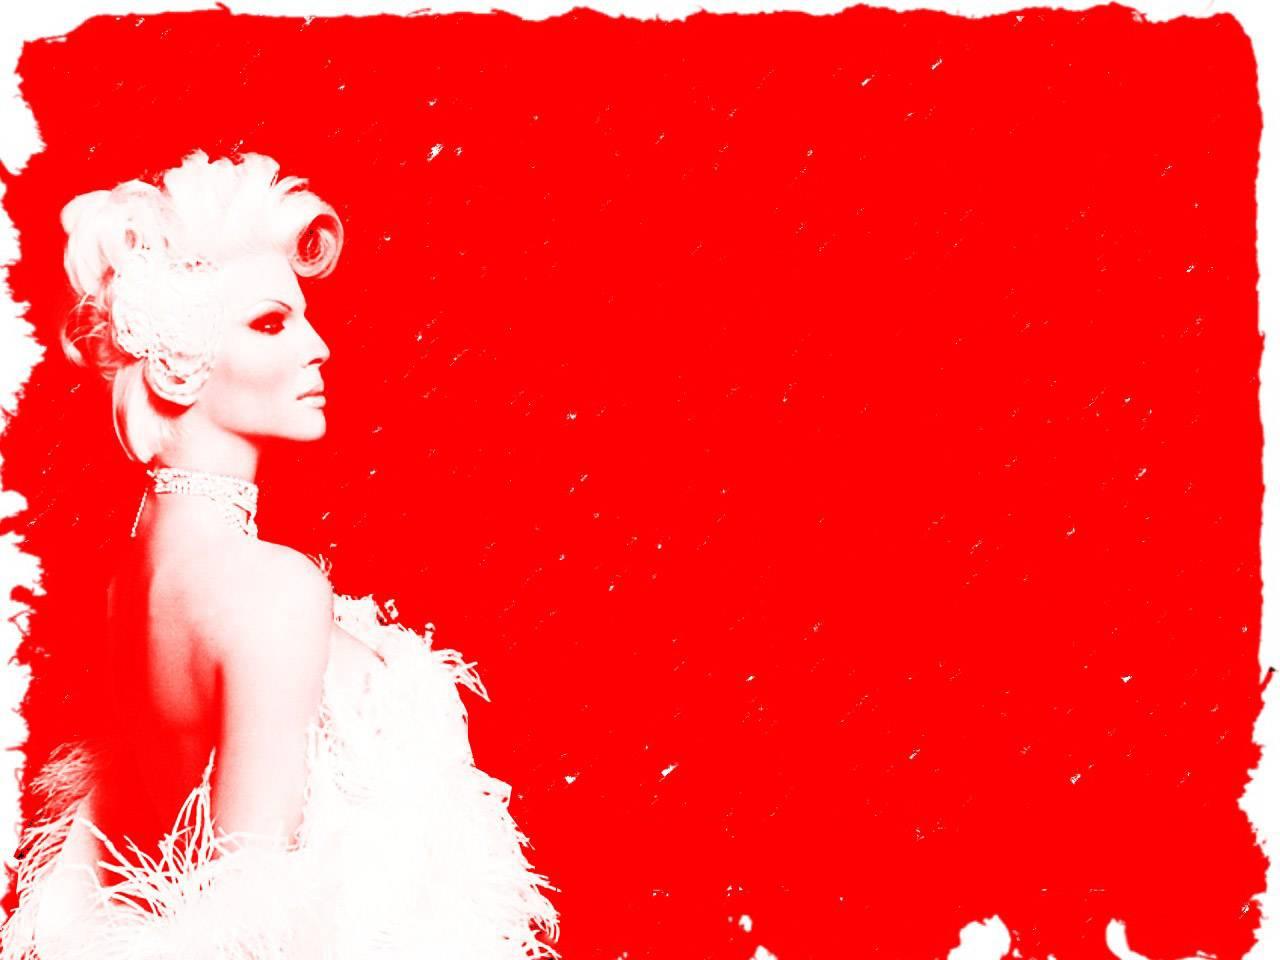 wallpaper Luan Santana 1